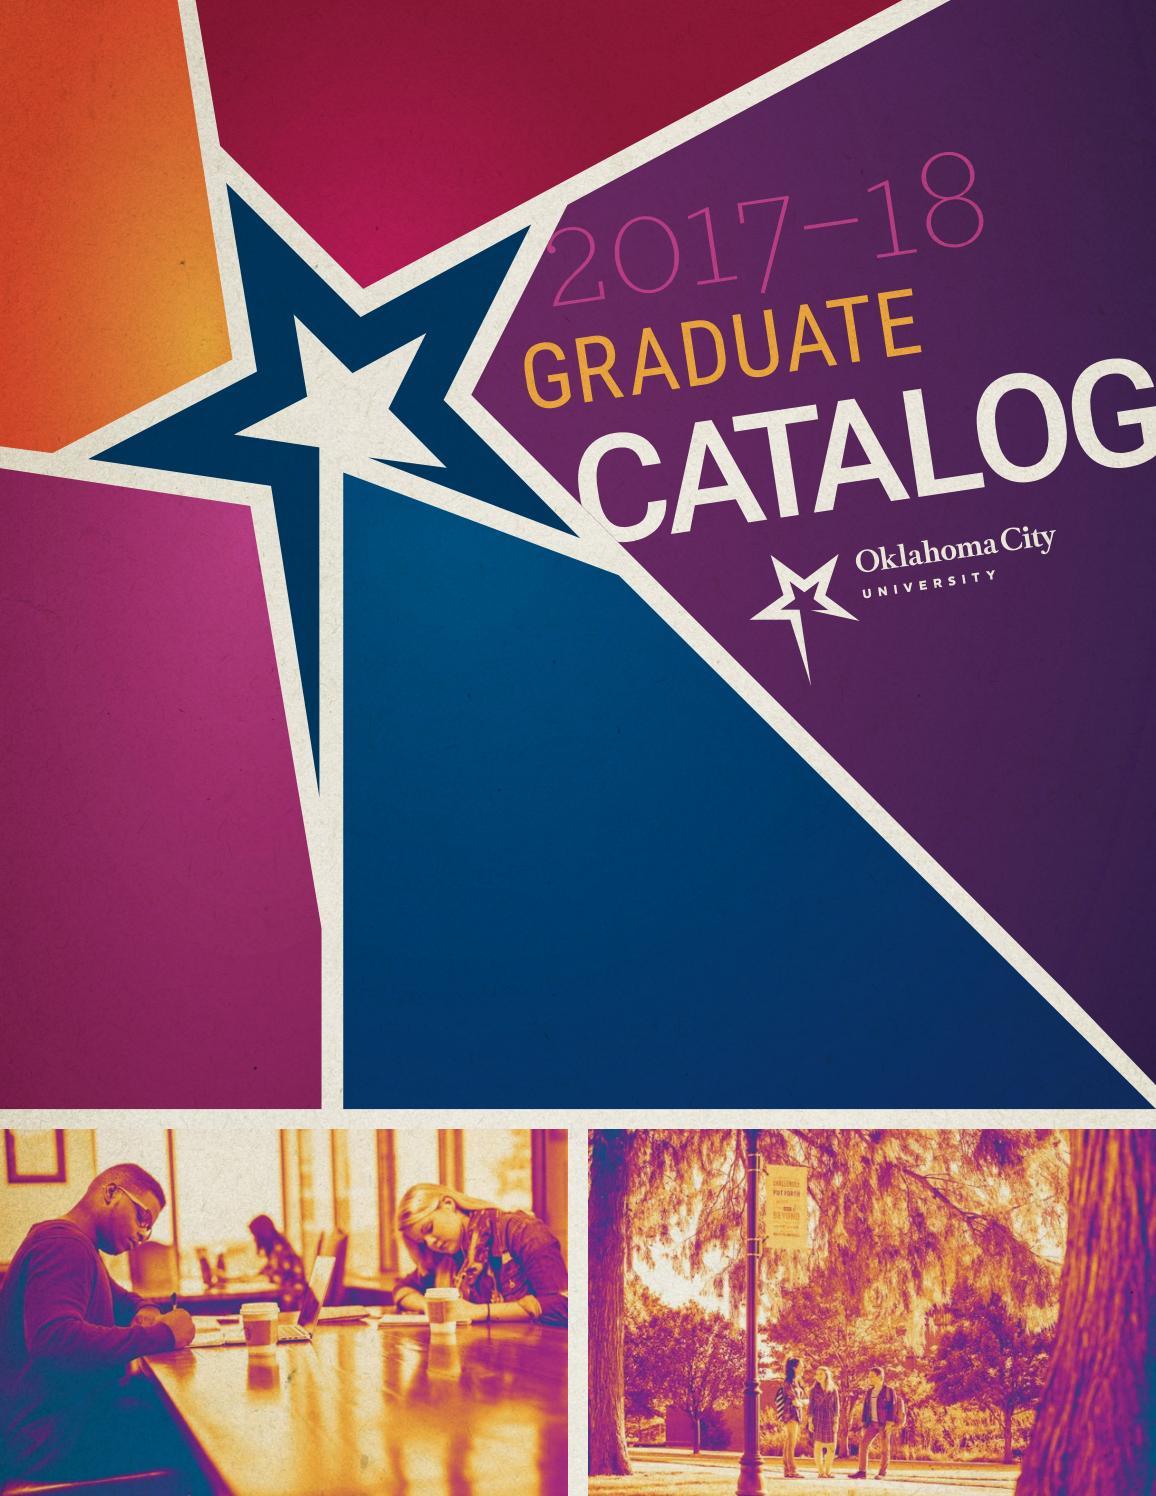 Okcu graduate catalog 2017 18 by oklahoma city university issuu falaconquin